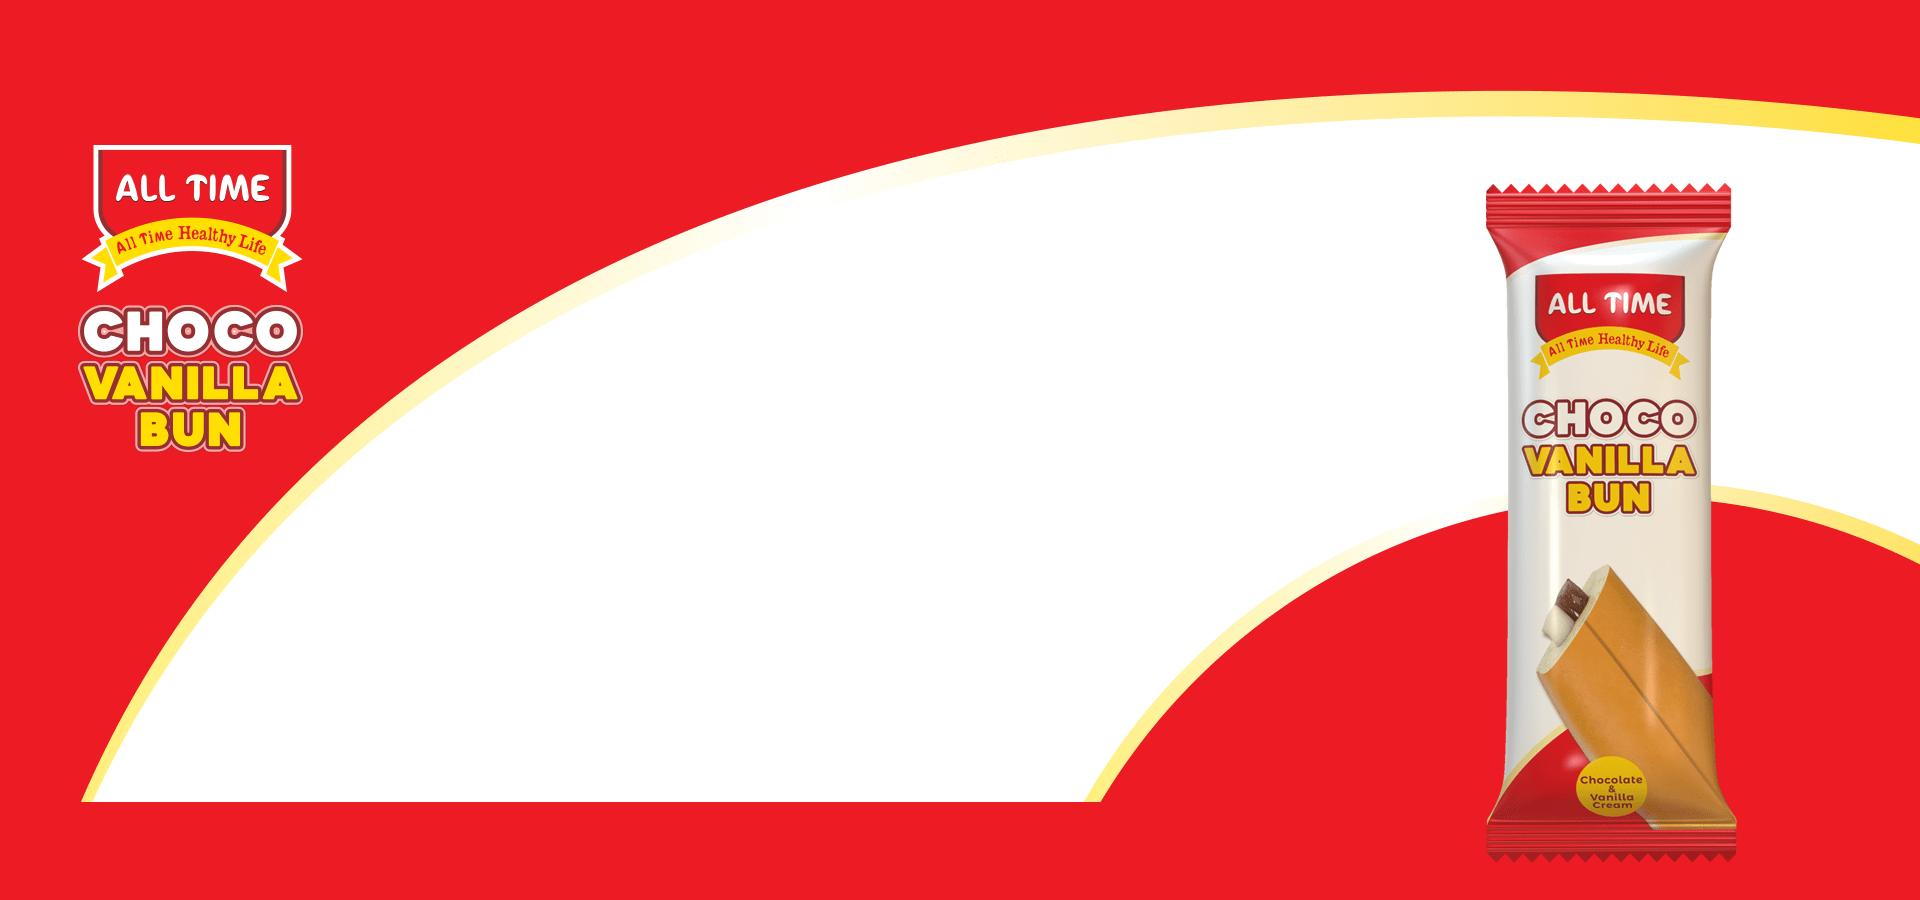 pruduct banner